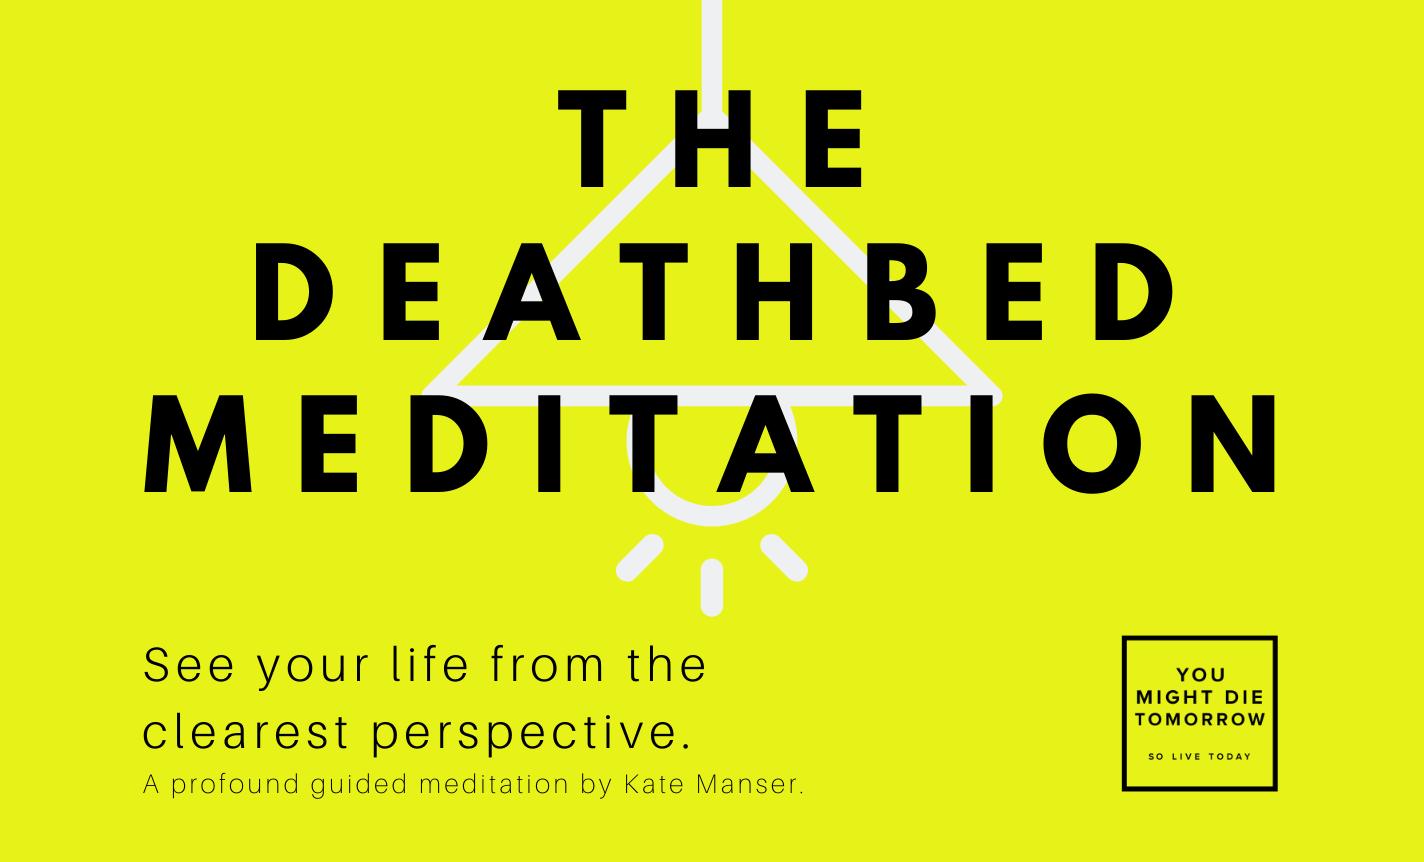 The Deathbed Meditation